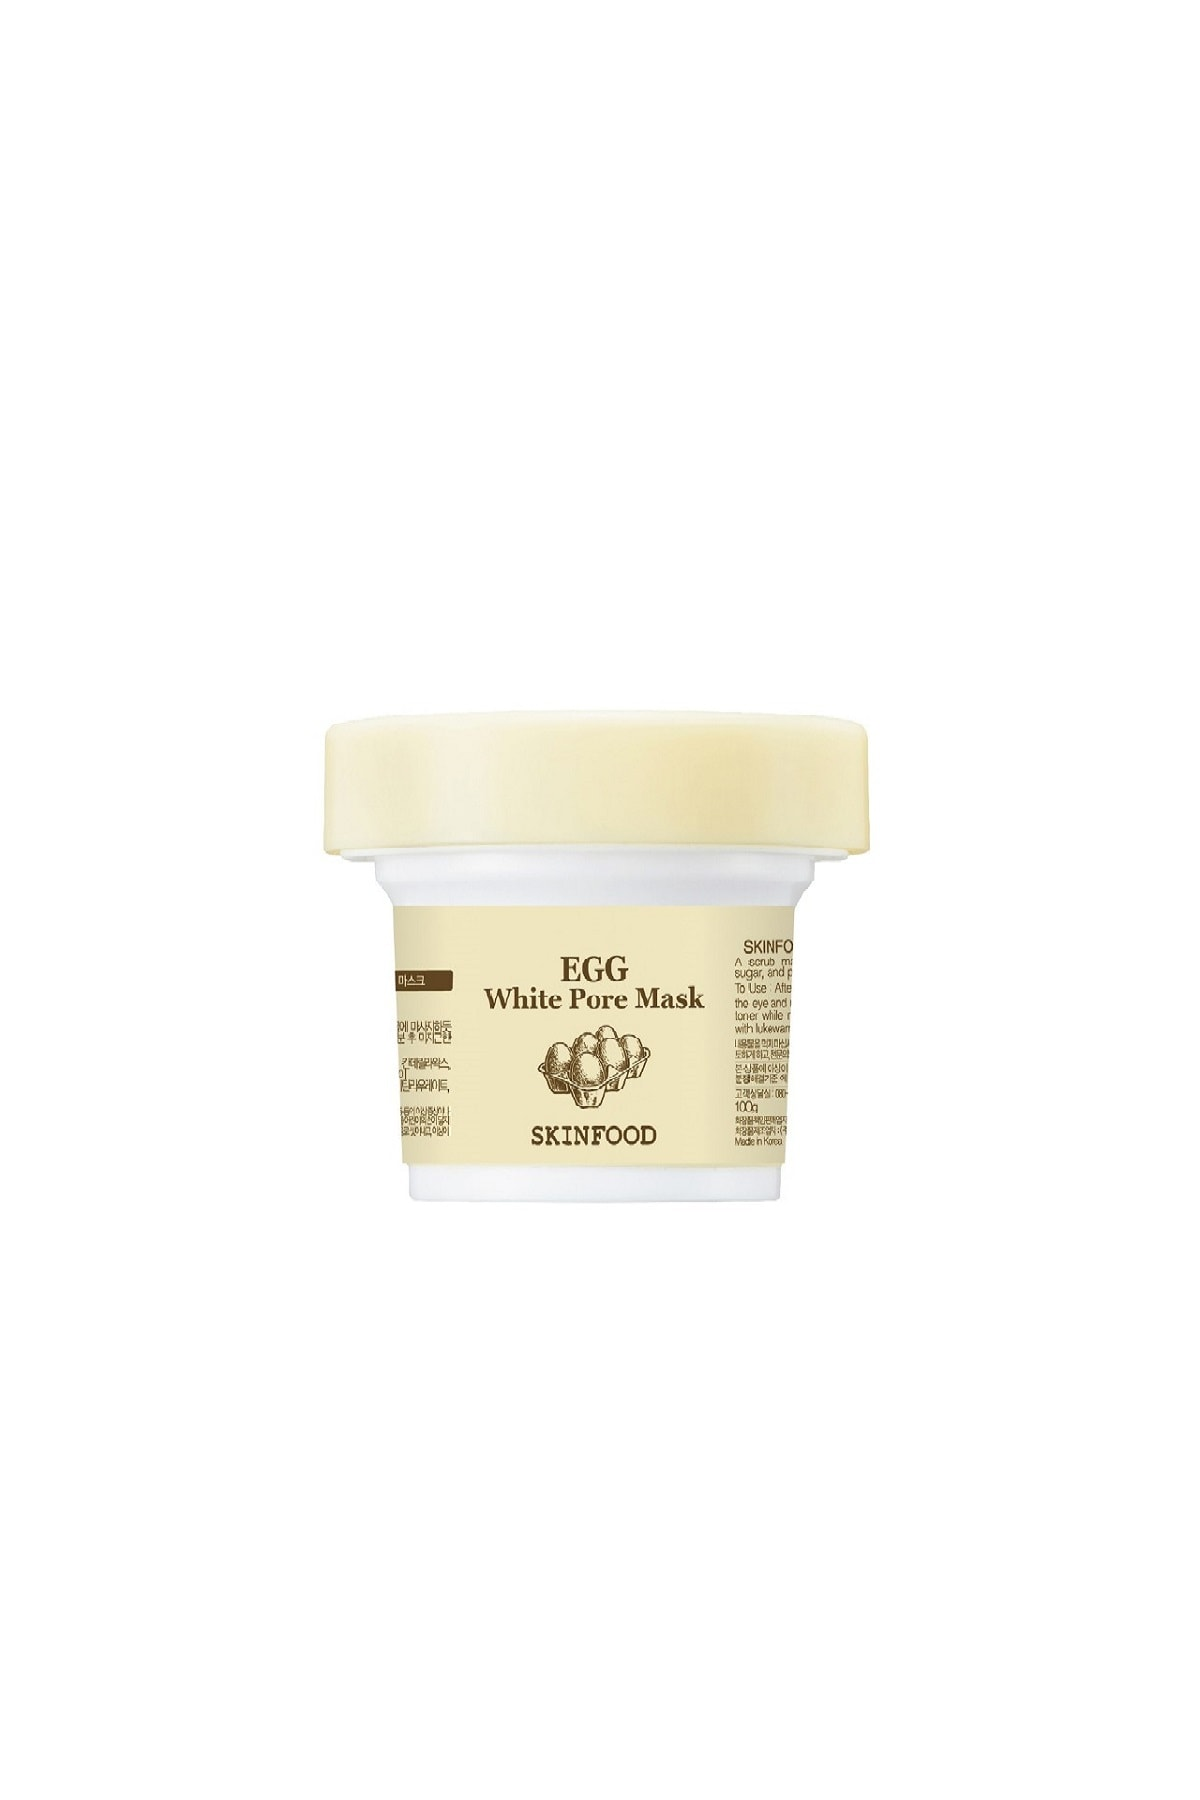 Skinfood Egg White Pore Mask 2